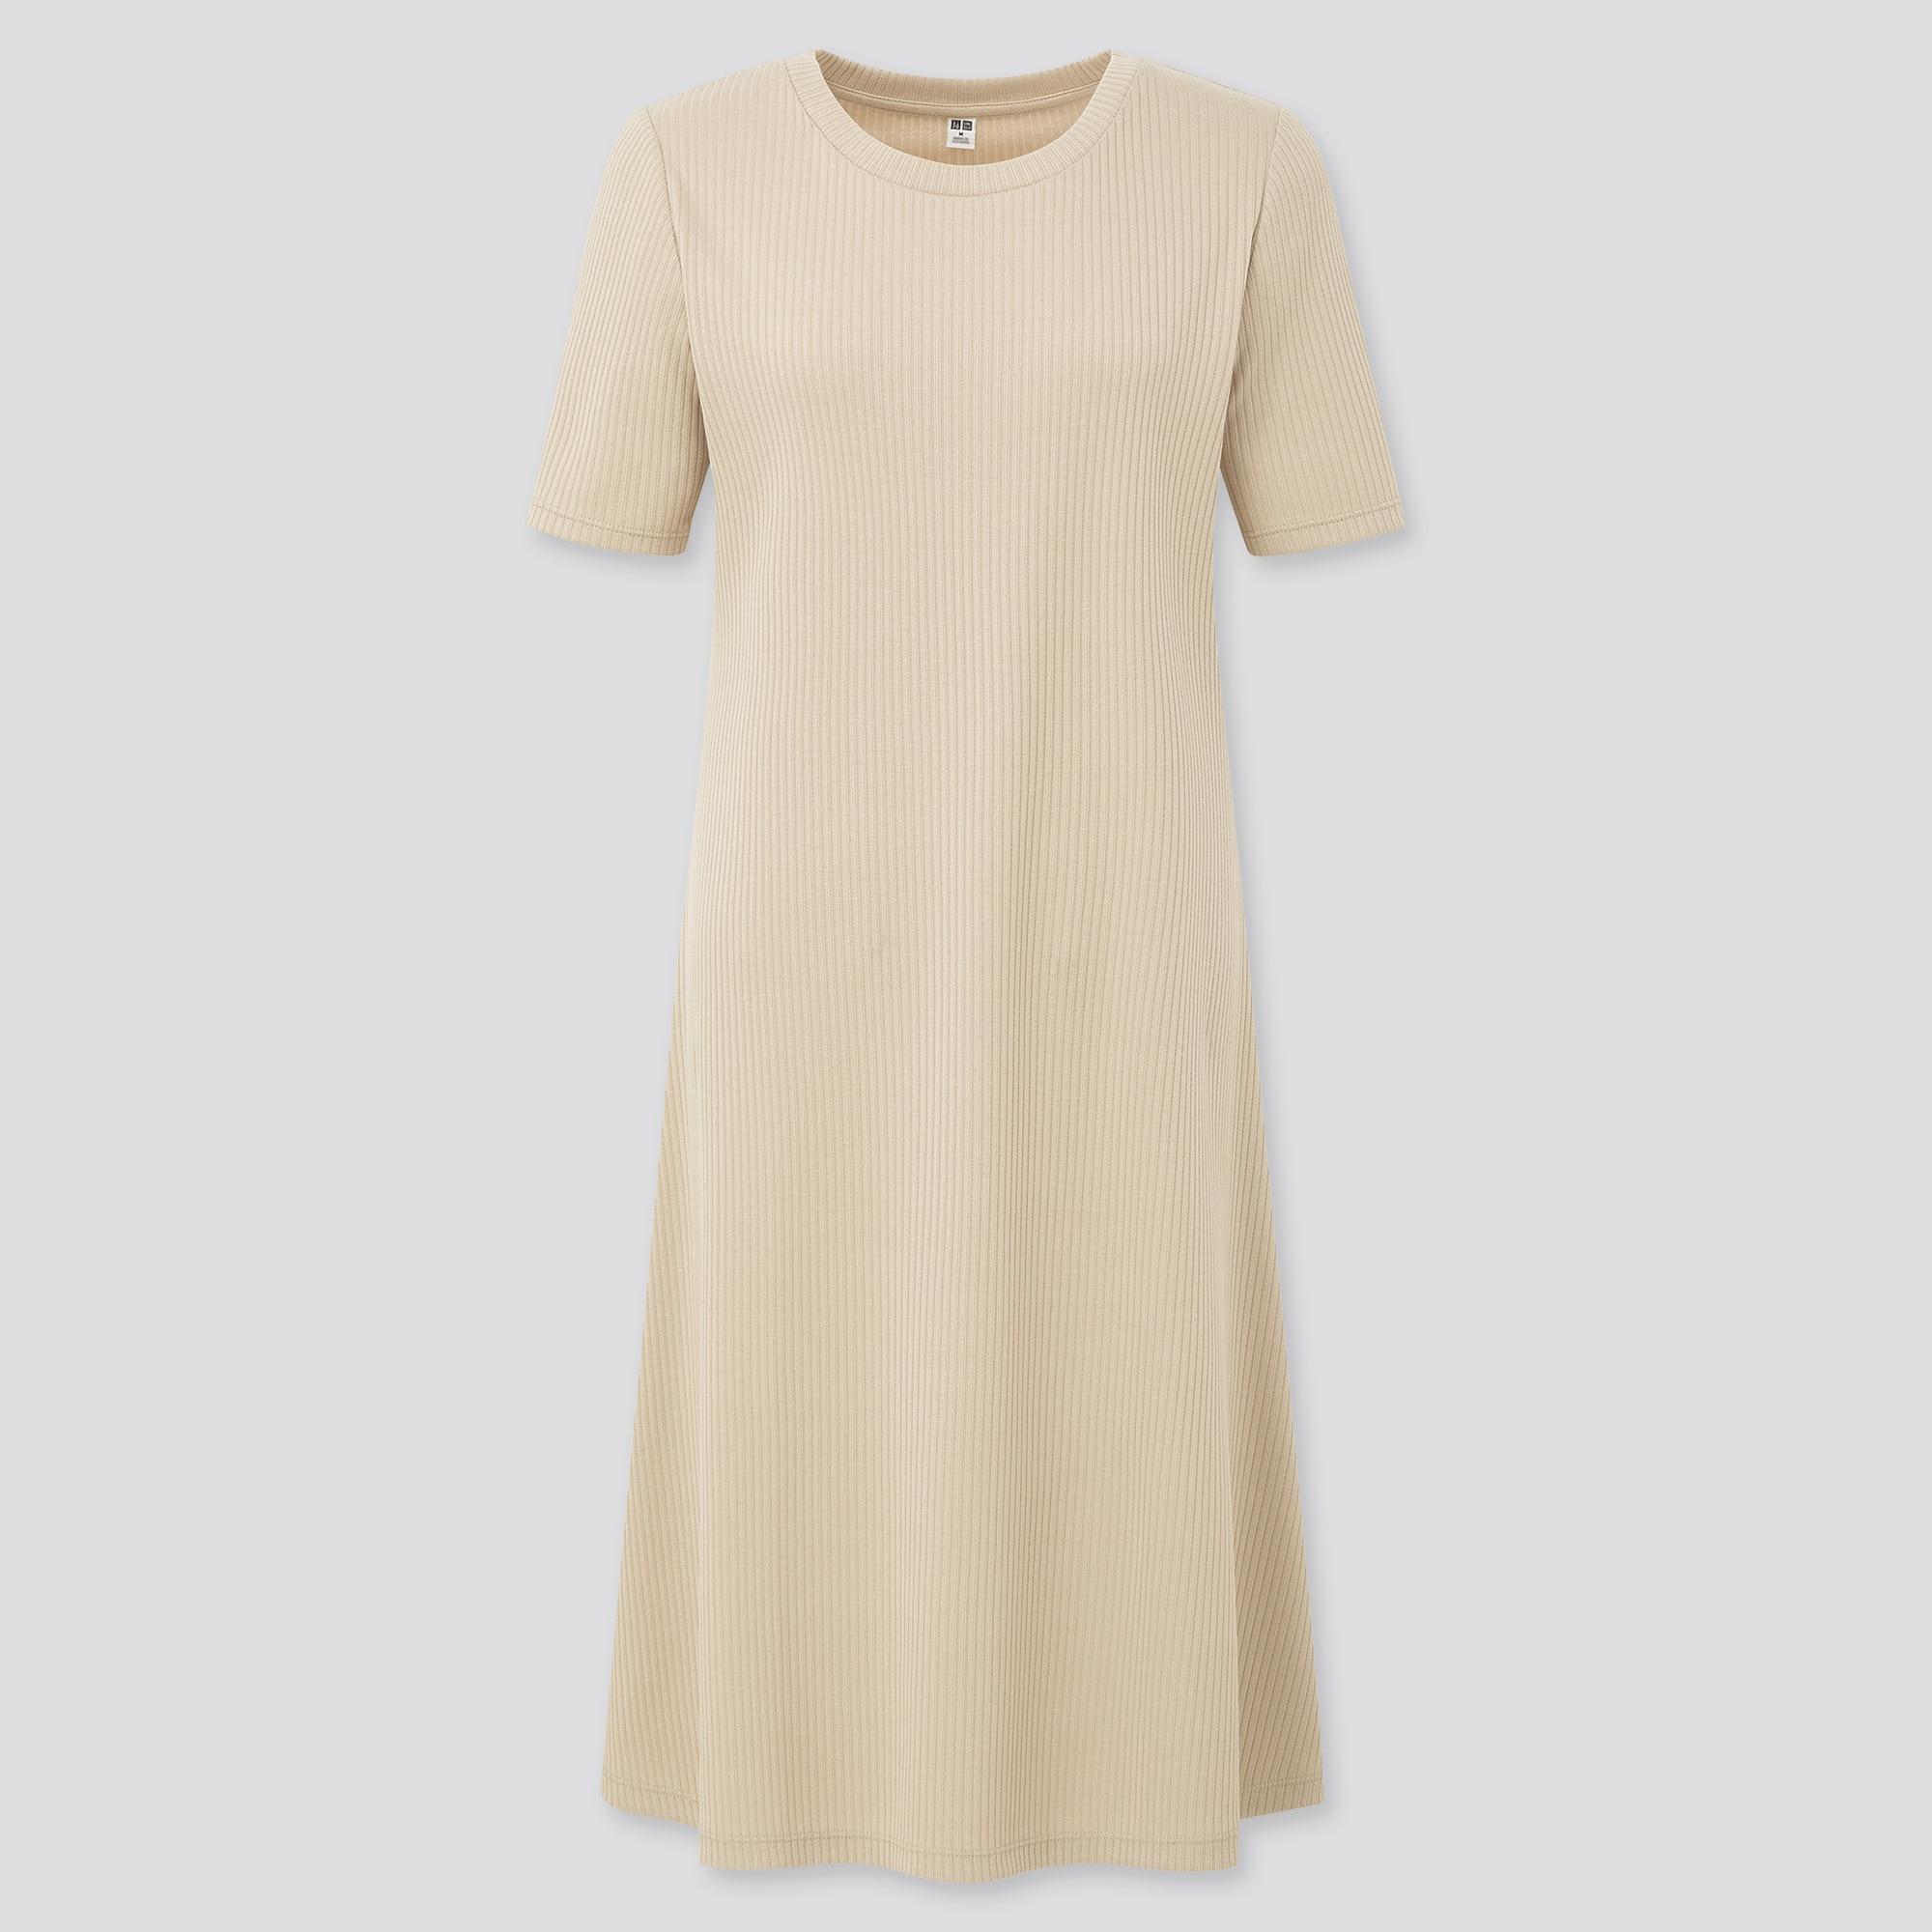 WOMEN RIBBED CREW NECK SHORT-SLEEVE FLARE DRESS